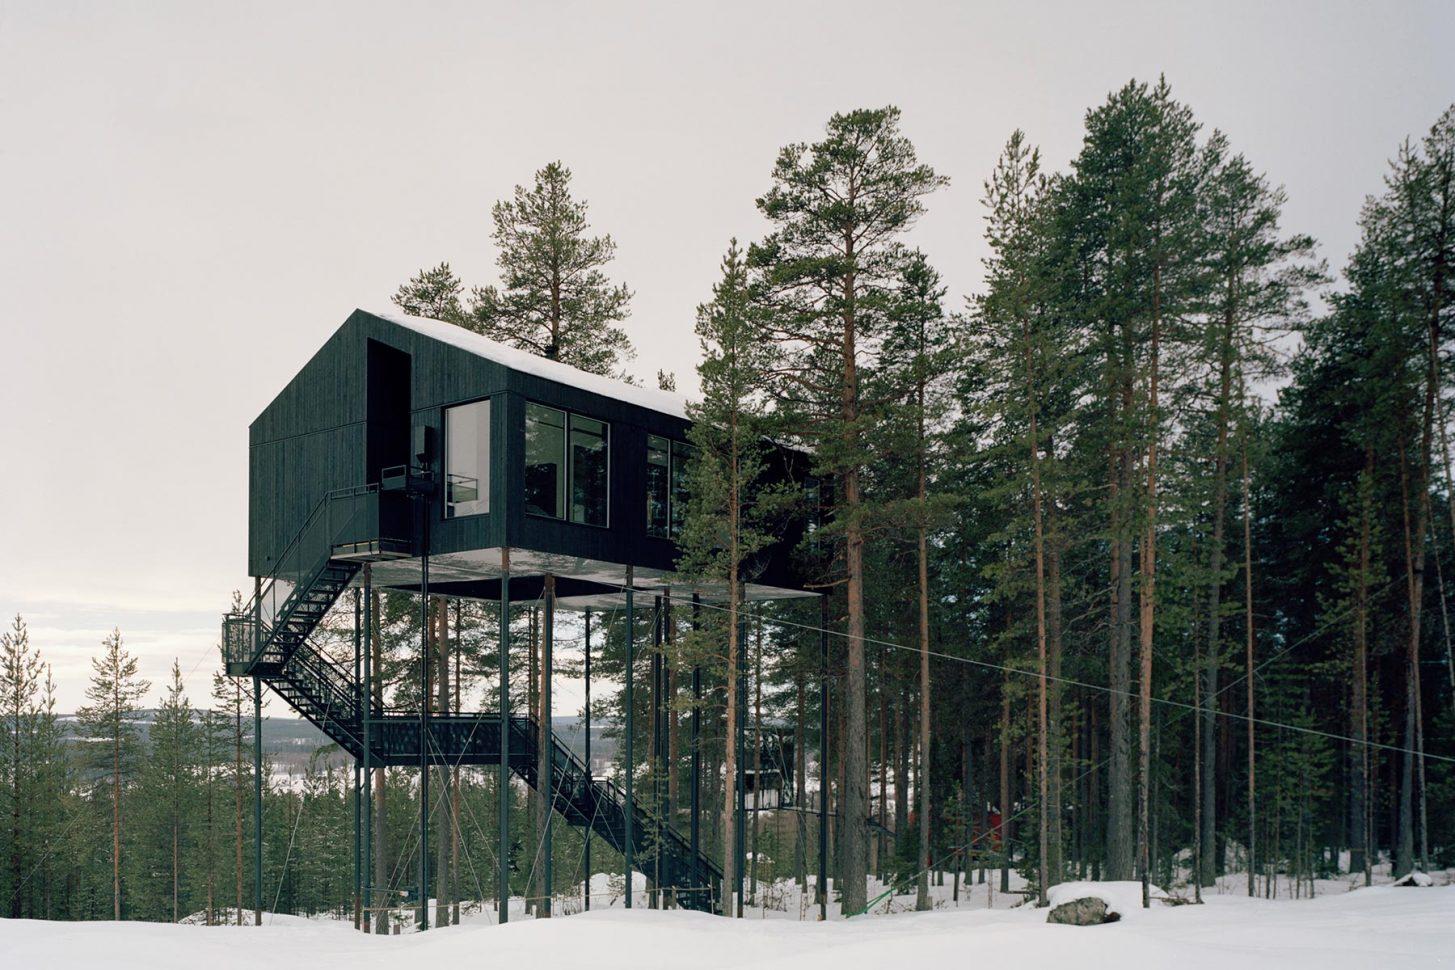 Tree-house-landscape2-1455x970.jpg